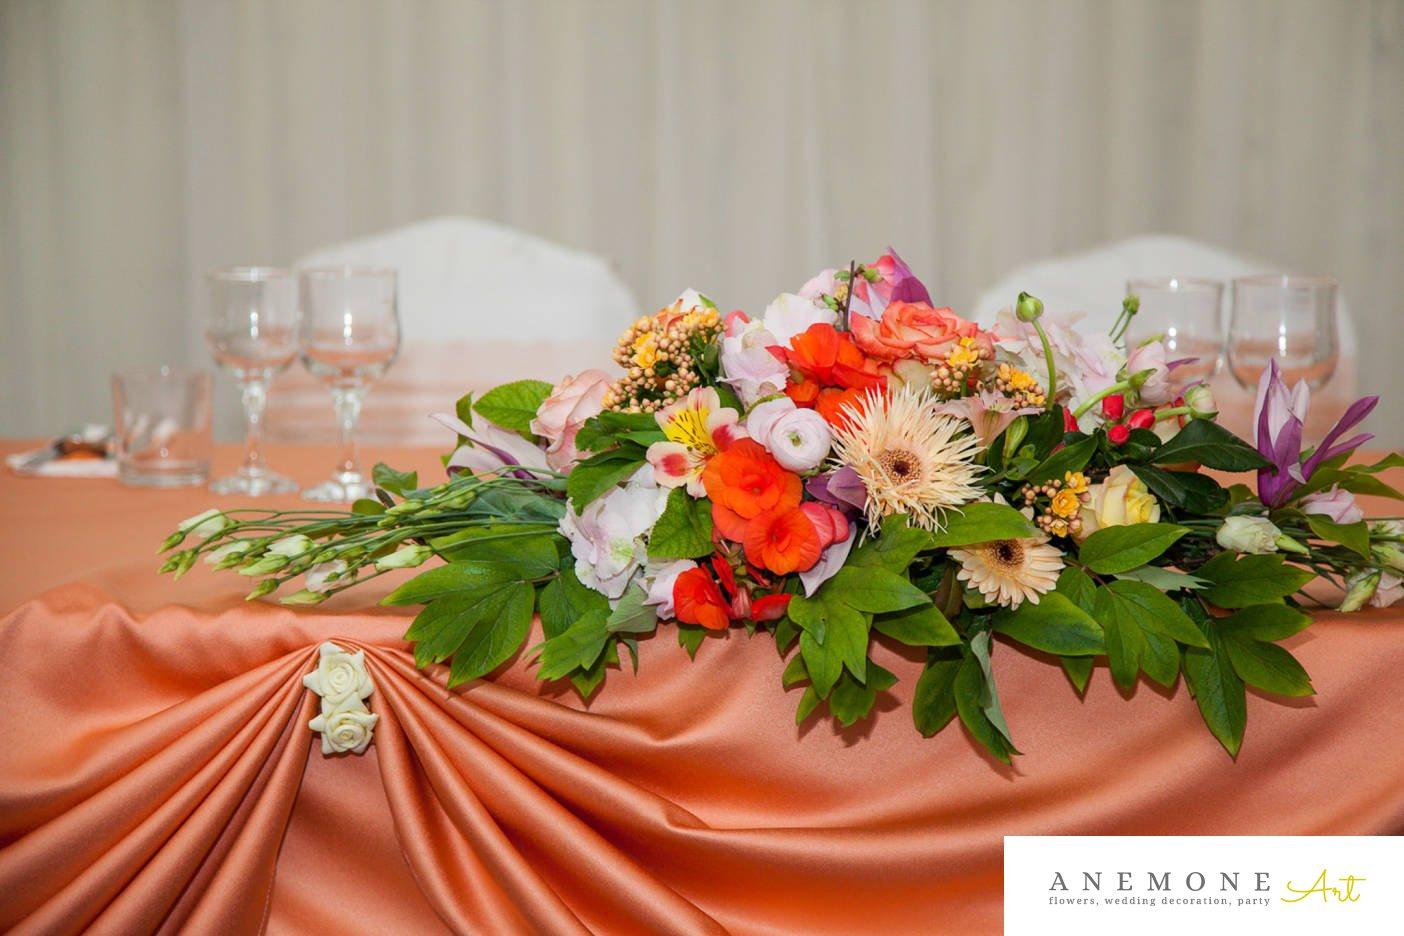 Poza, foto cu Flori de nunta alstroemeria, decor masa, gerbera, magnolia, mini-rosa, multicolor, trandafiri in Arad, Timisoara, Oradea (wedding flowers, bouquets) nunta Arad, Timisoara, Oradea